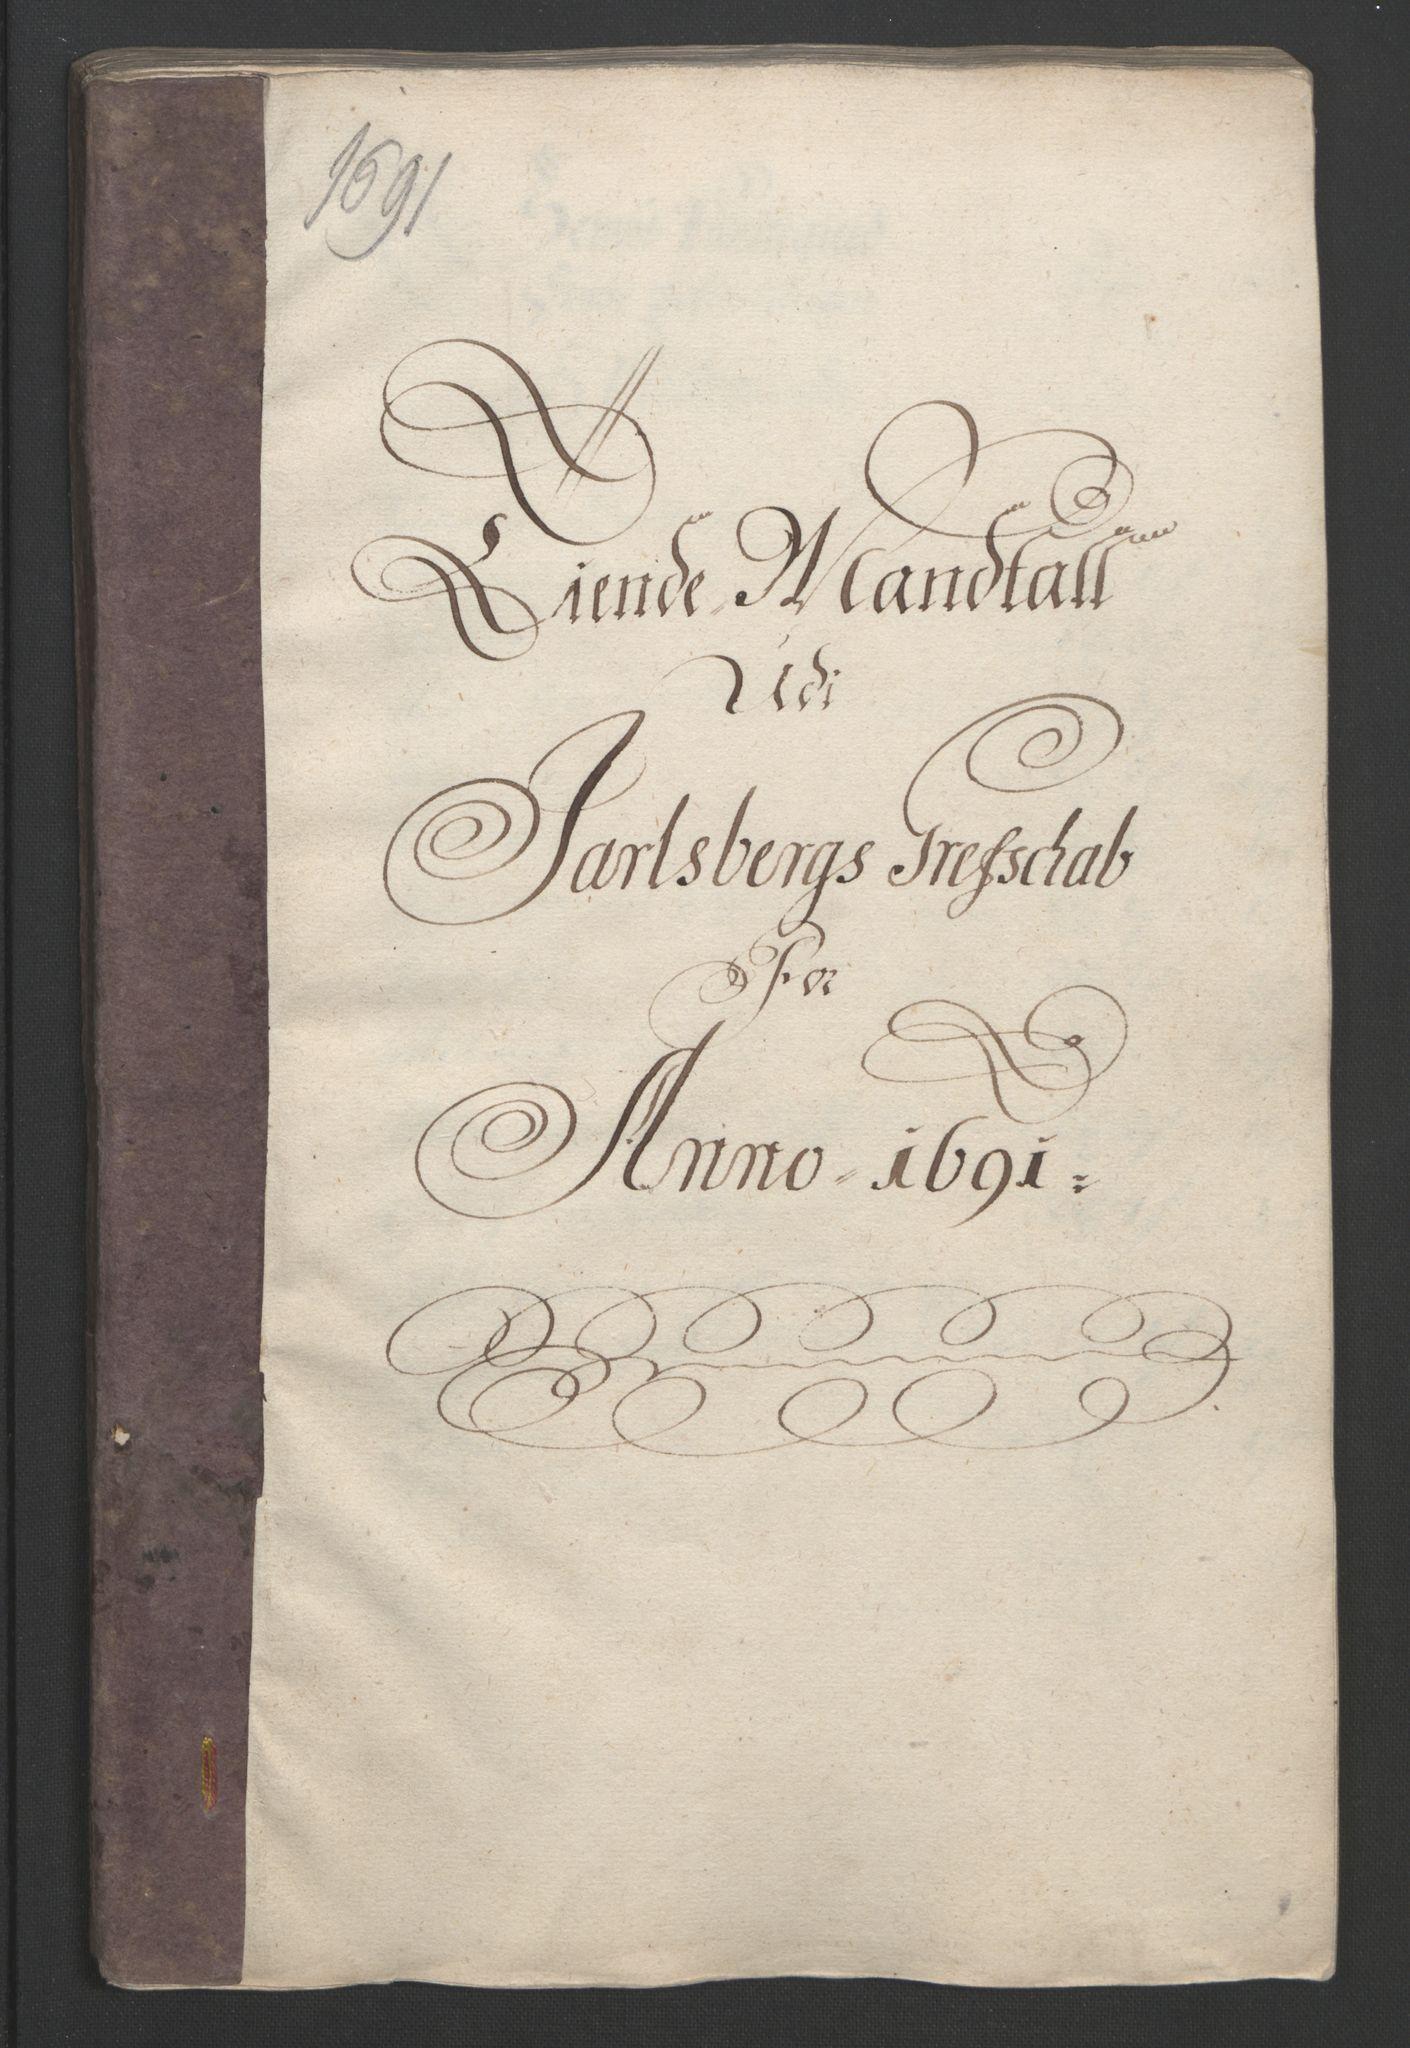 RA, Rentekammeret inntil 1814, Reviderte regnskaper, Fogderegnskap, R32/L1864: Fogderegnskap Jarlsberg grevskap, 1691, s. 334